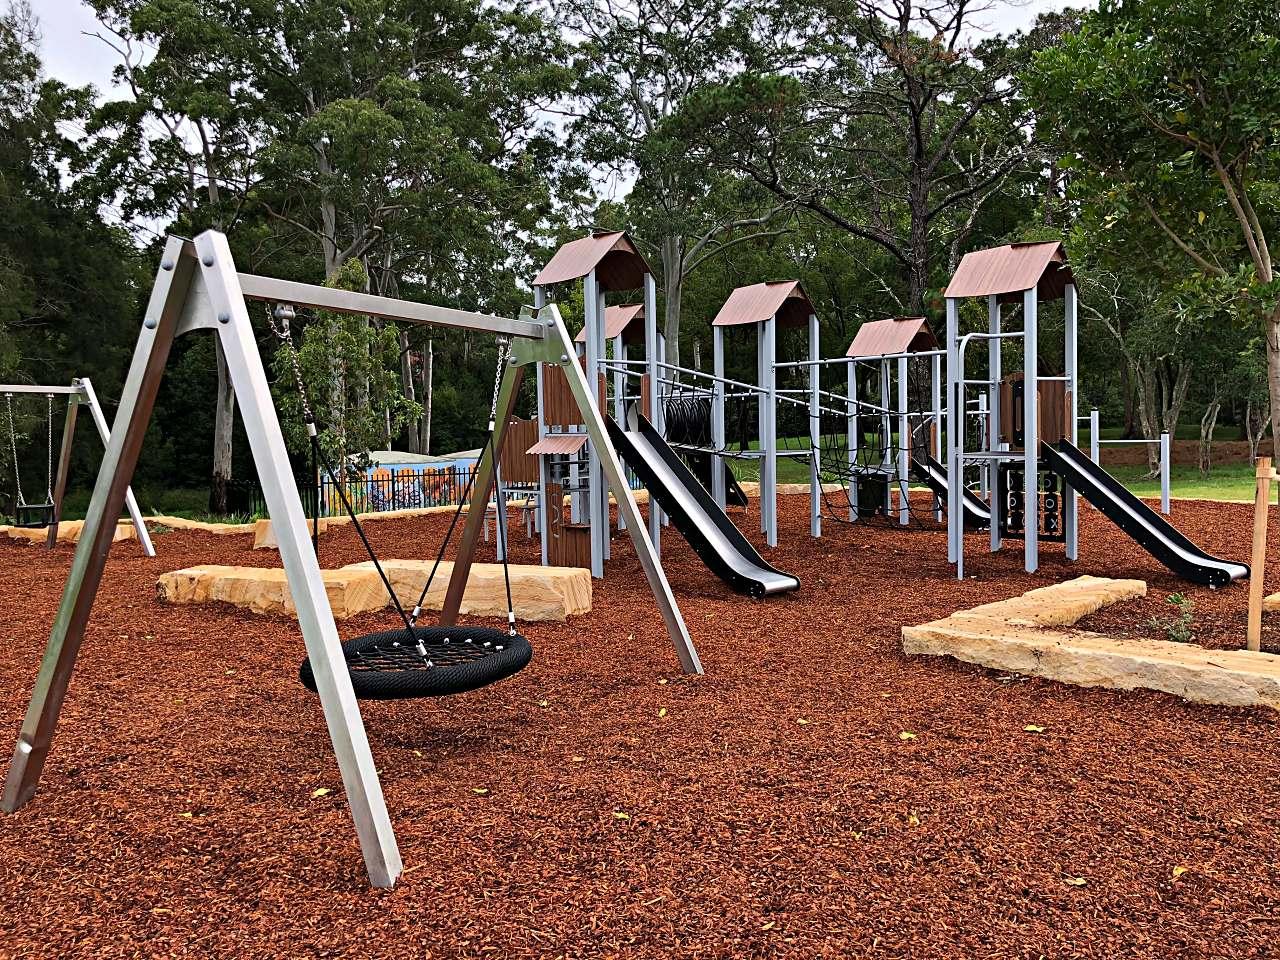 Alan Davidson Oval playground group swing